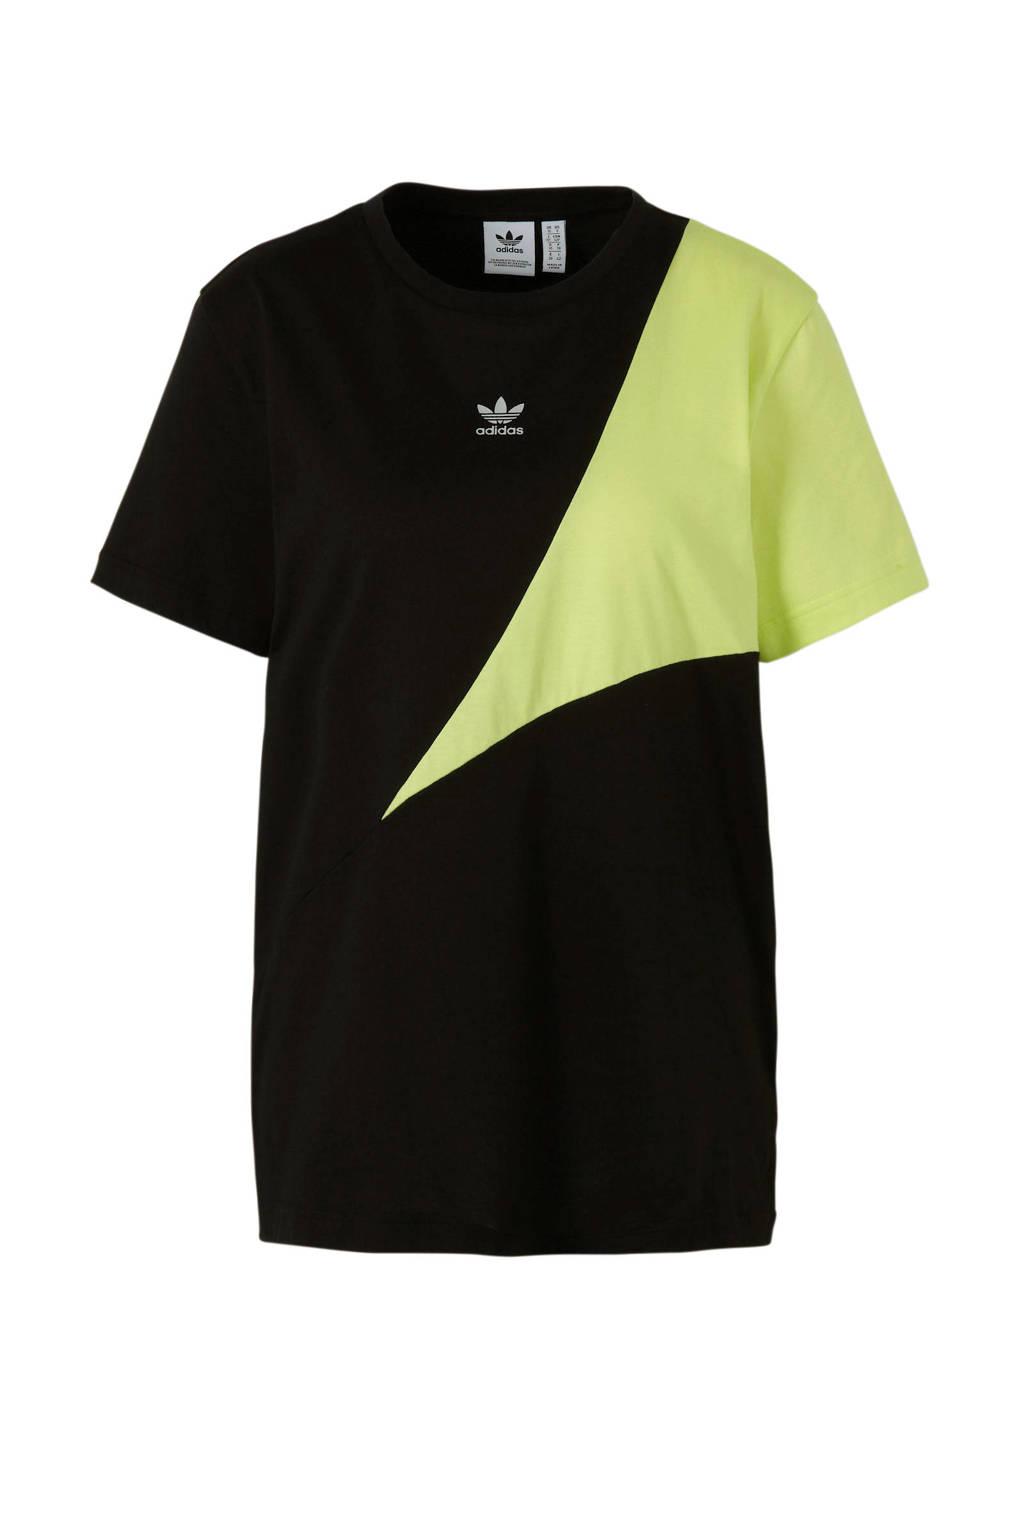 adidas originals T-shirt zwart/geel, Zwart/geel